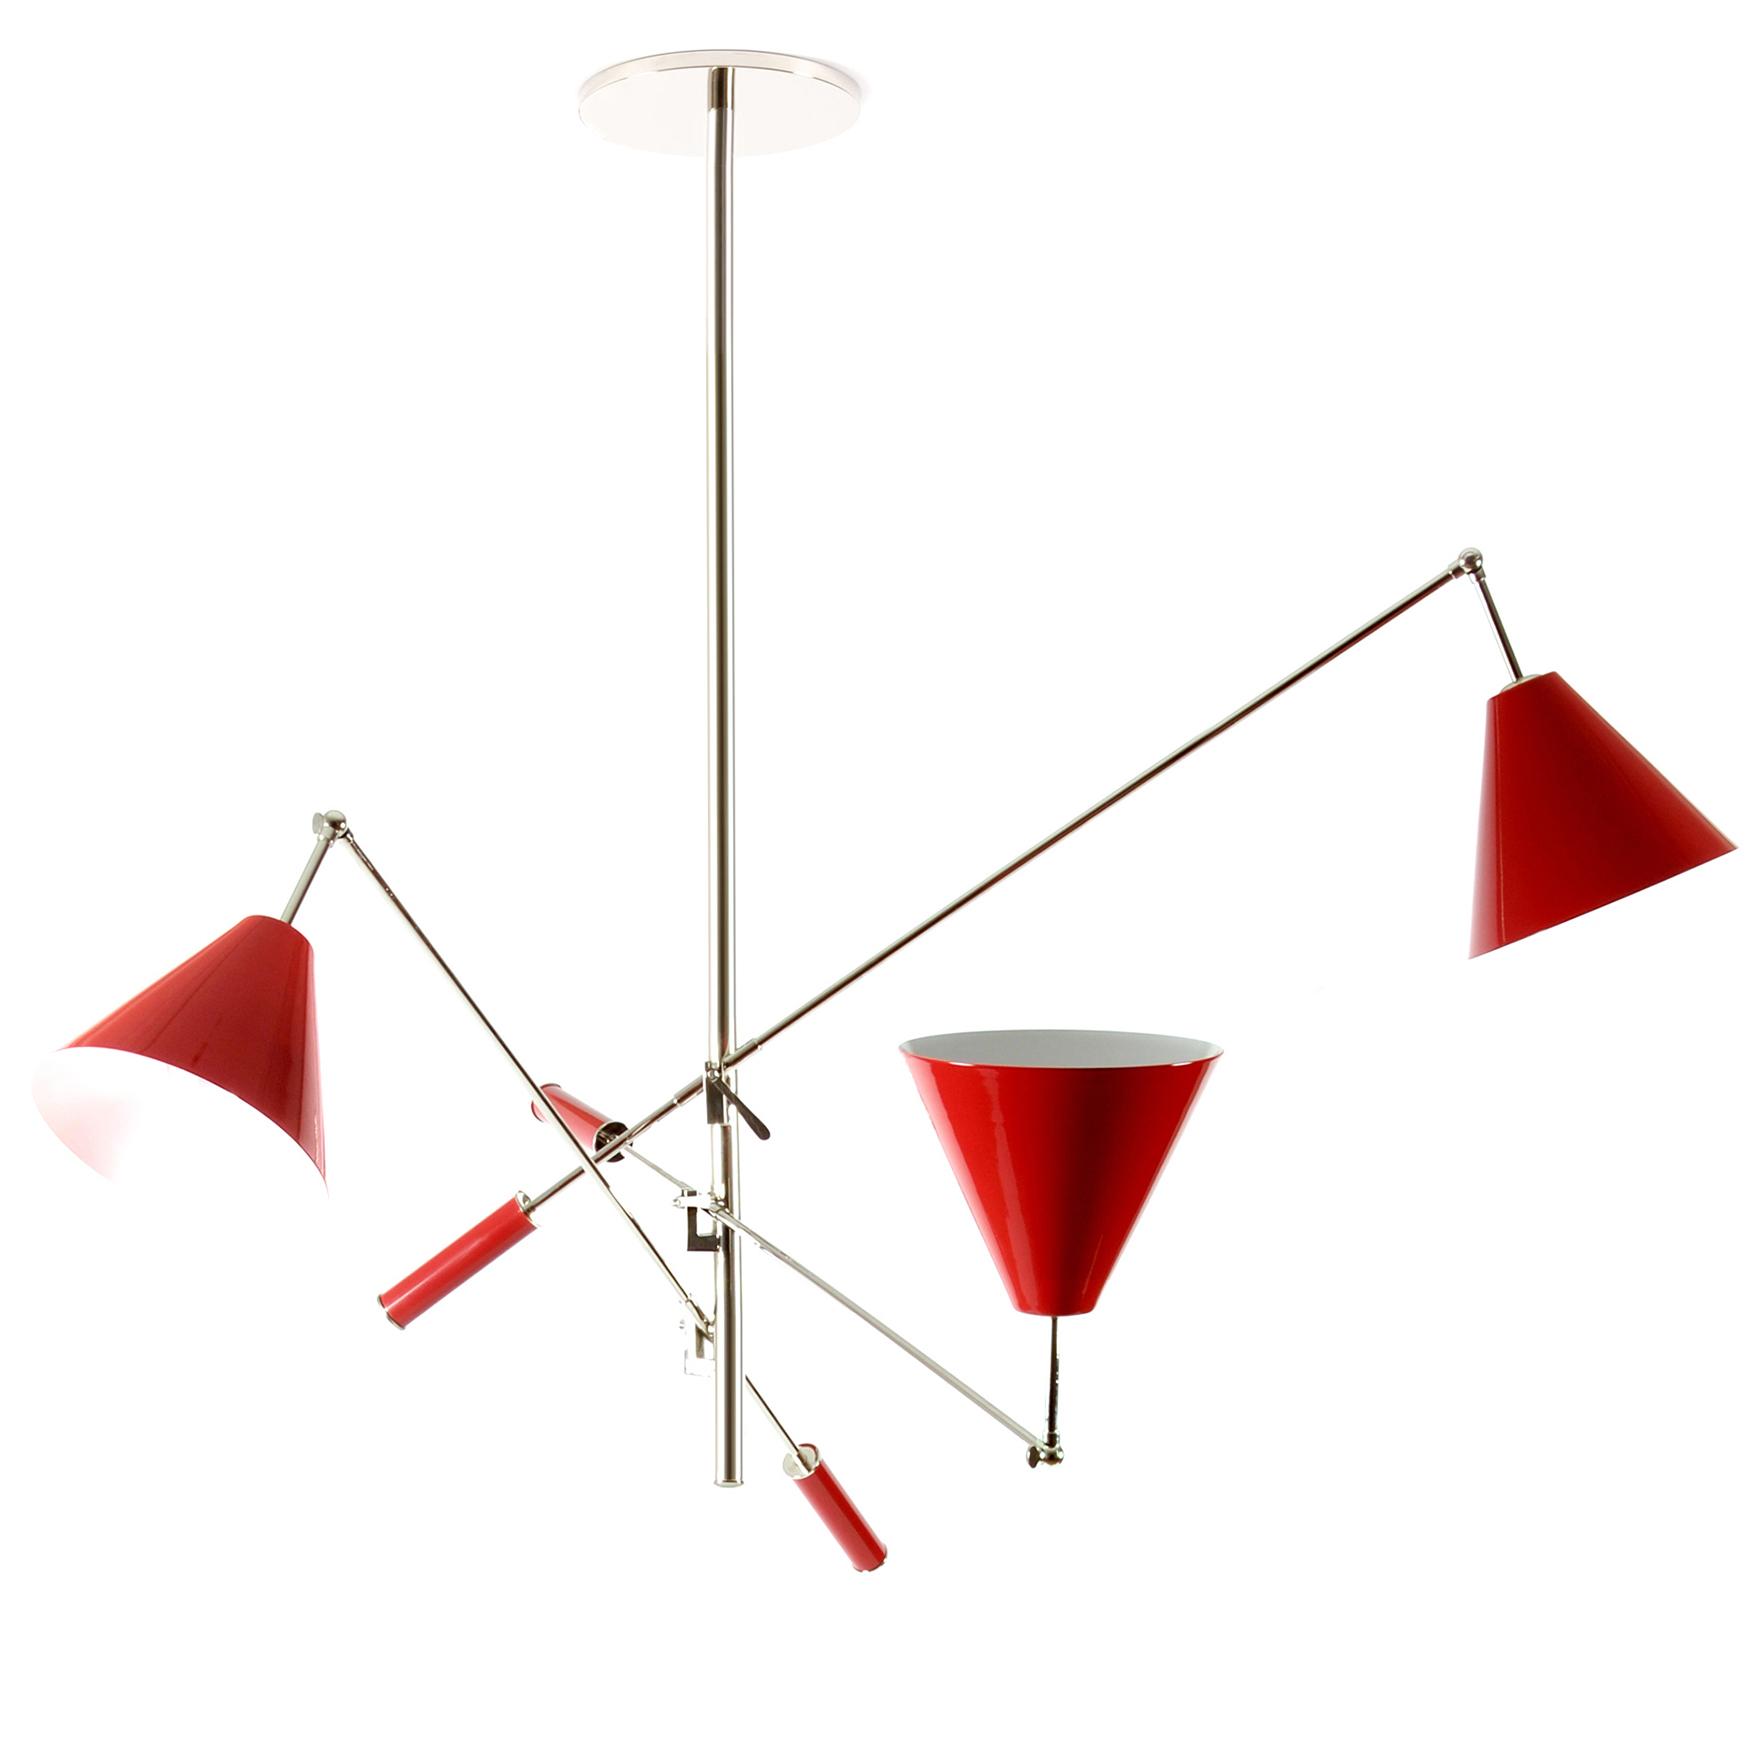 Swing arm chandelier by delightfull sinatra su sinatra swing arm chandelier download image arubaitofo Image collections